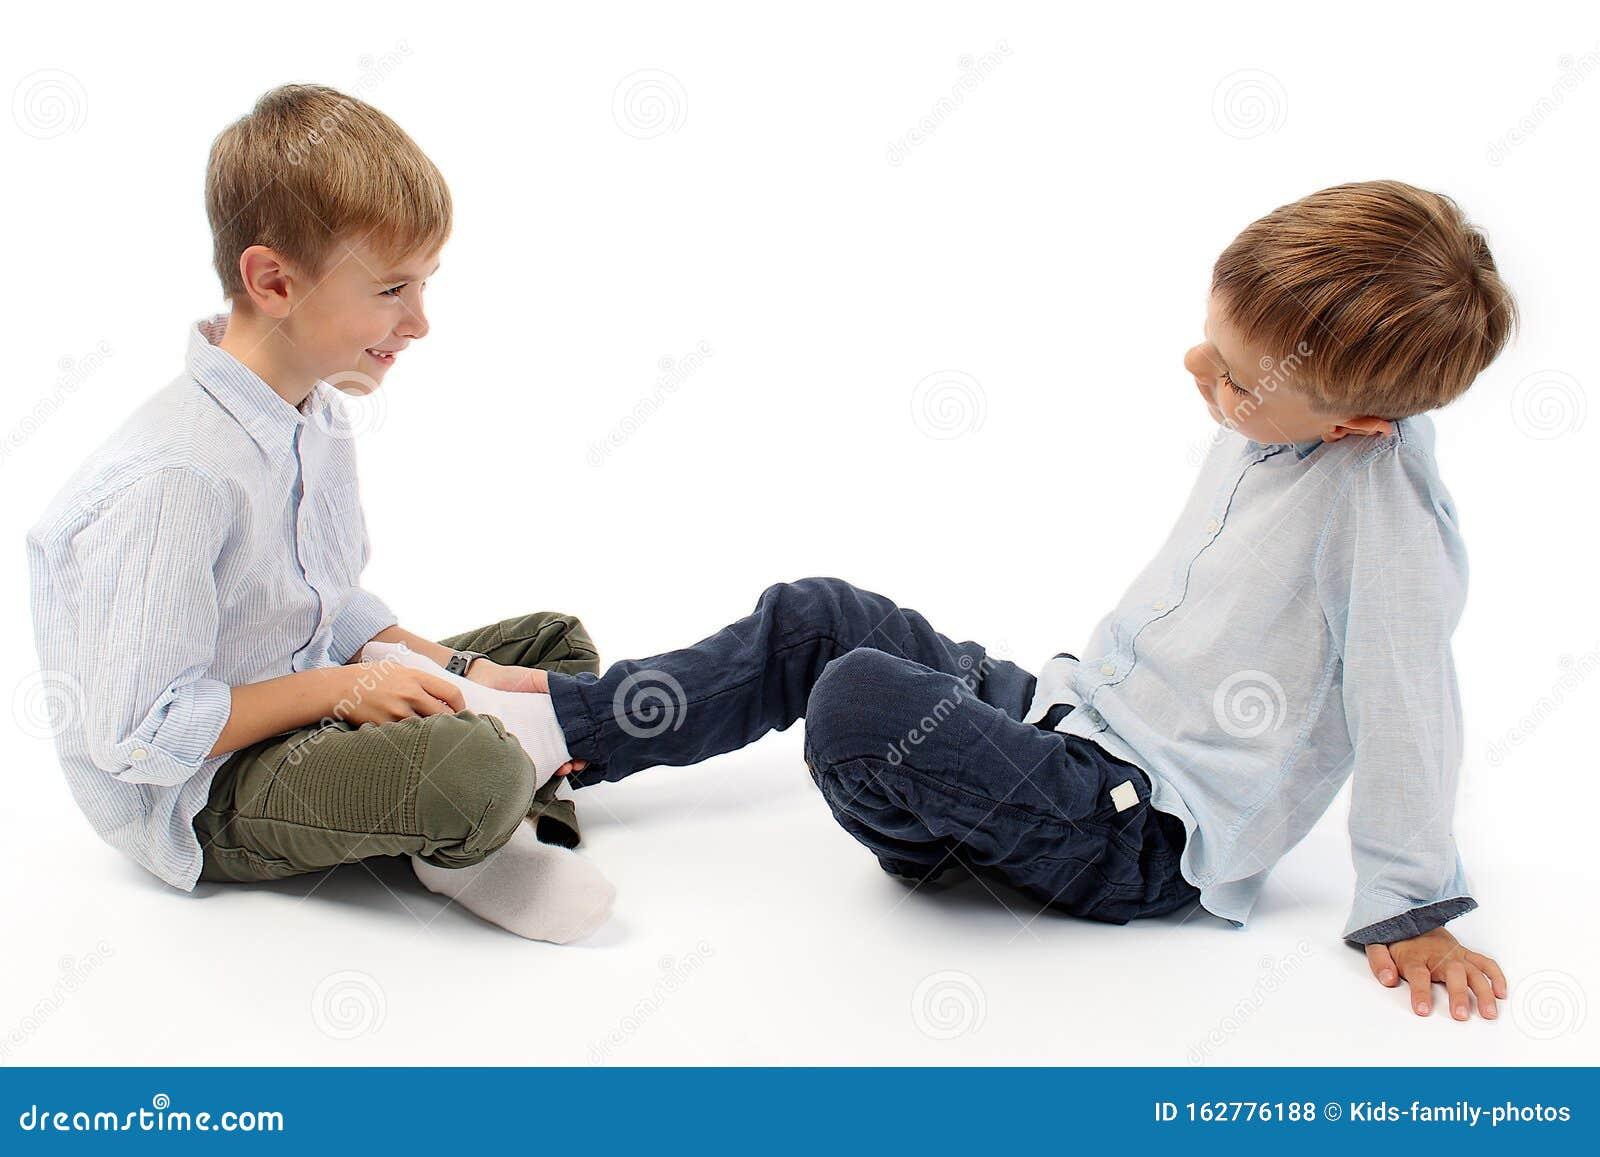 Tickle feet fight